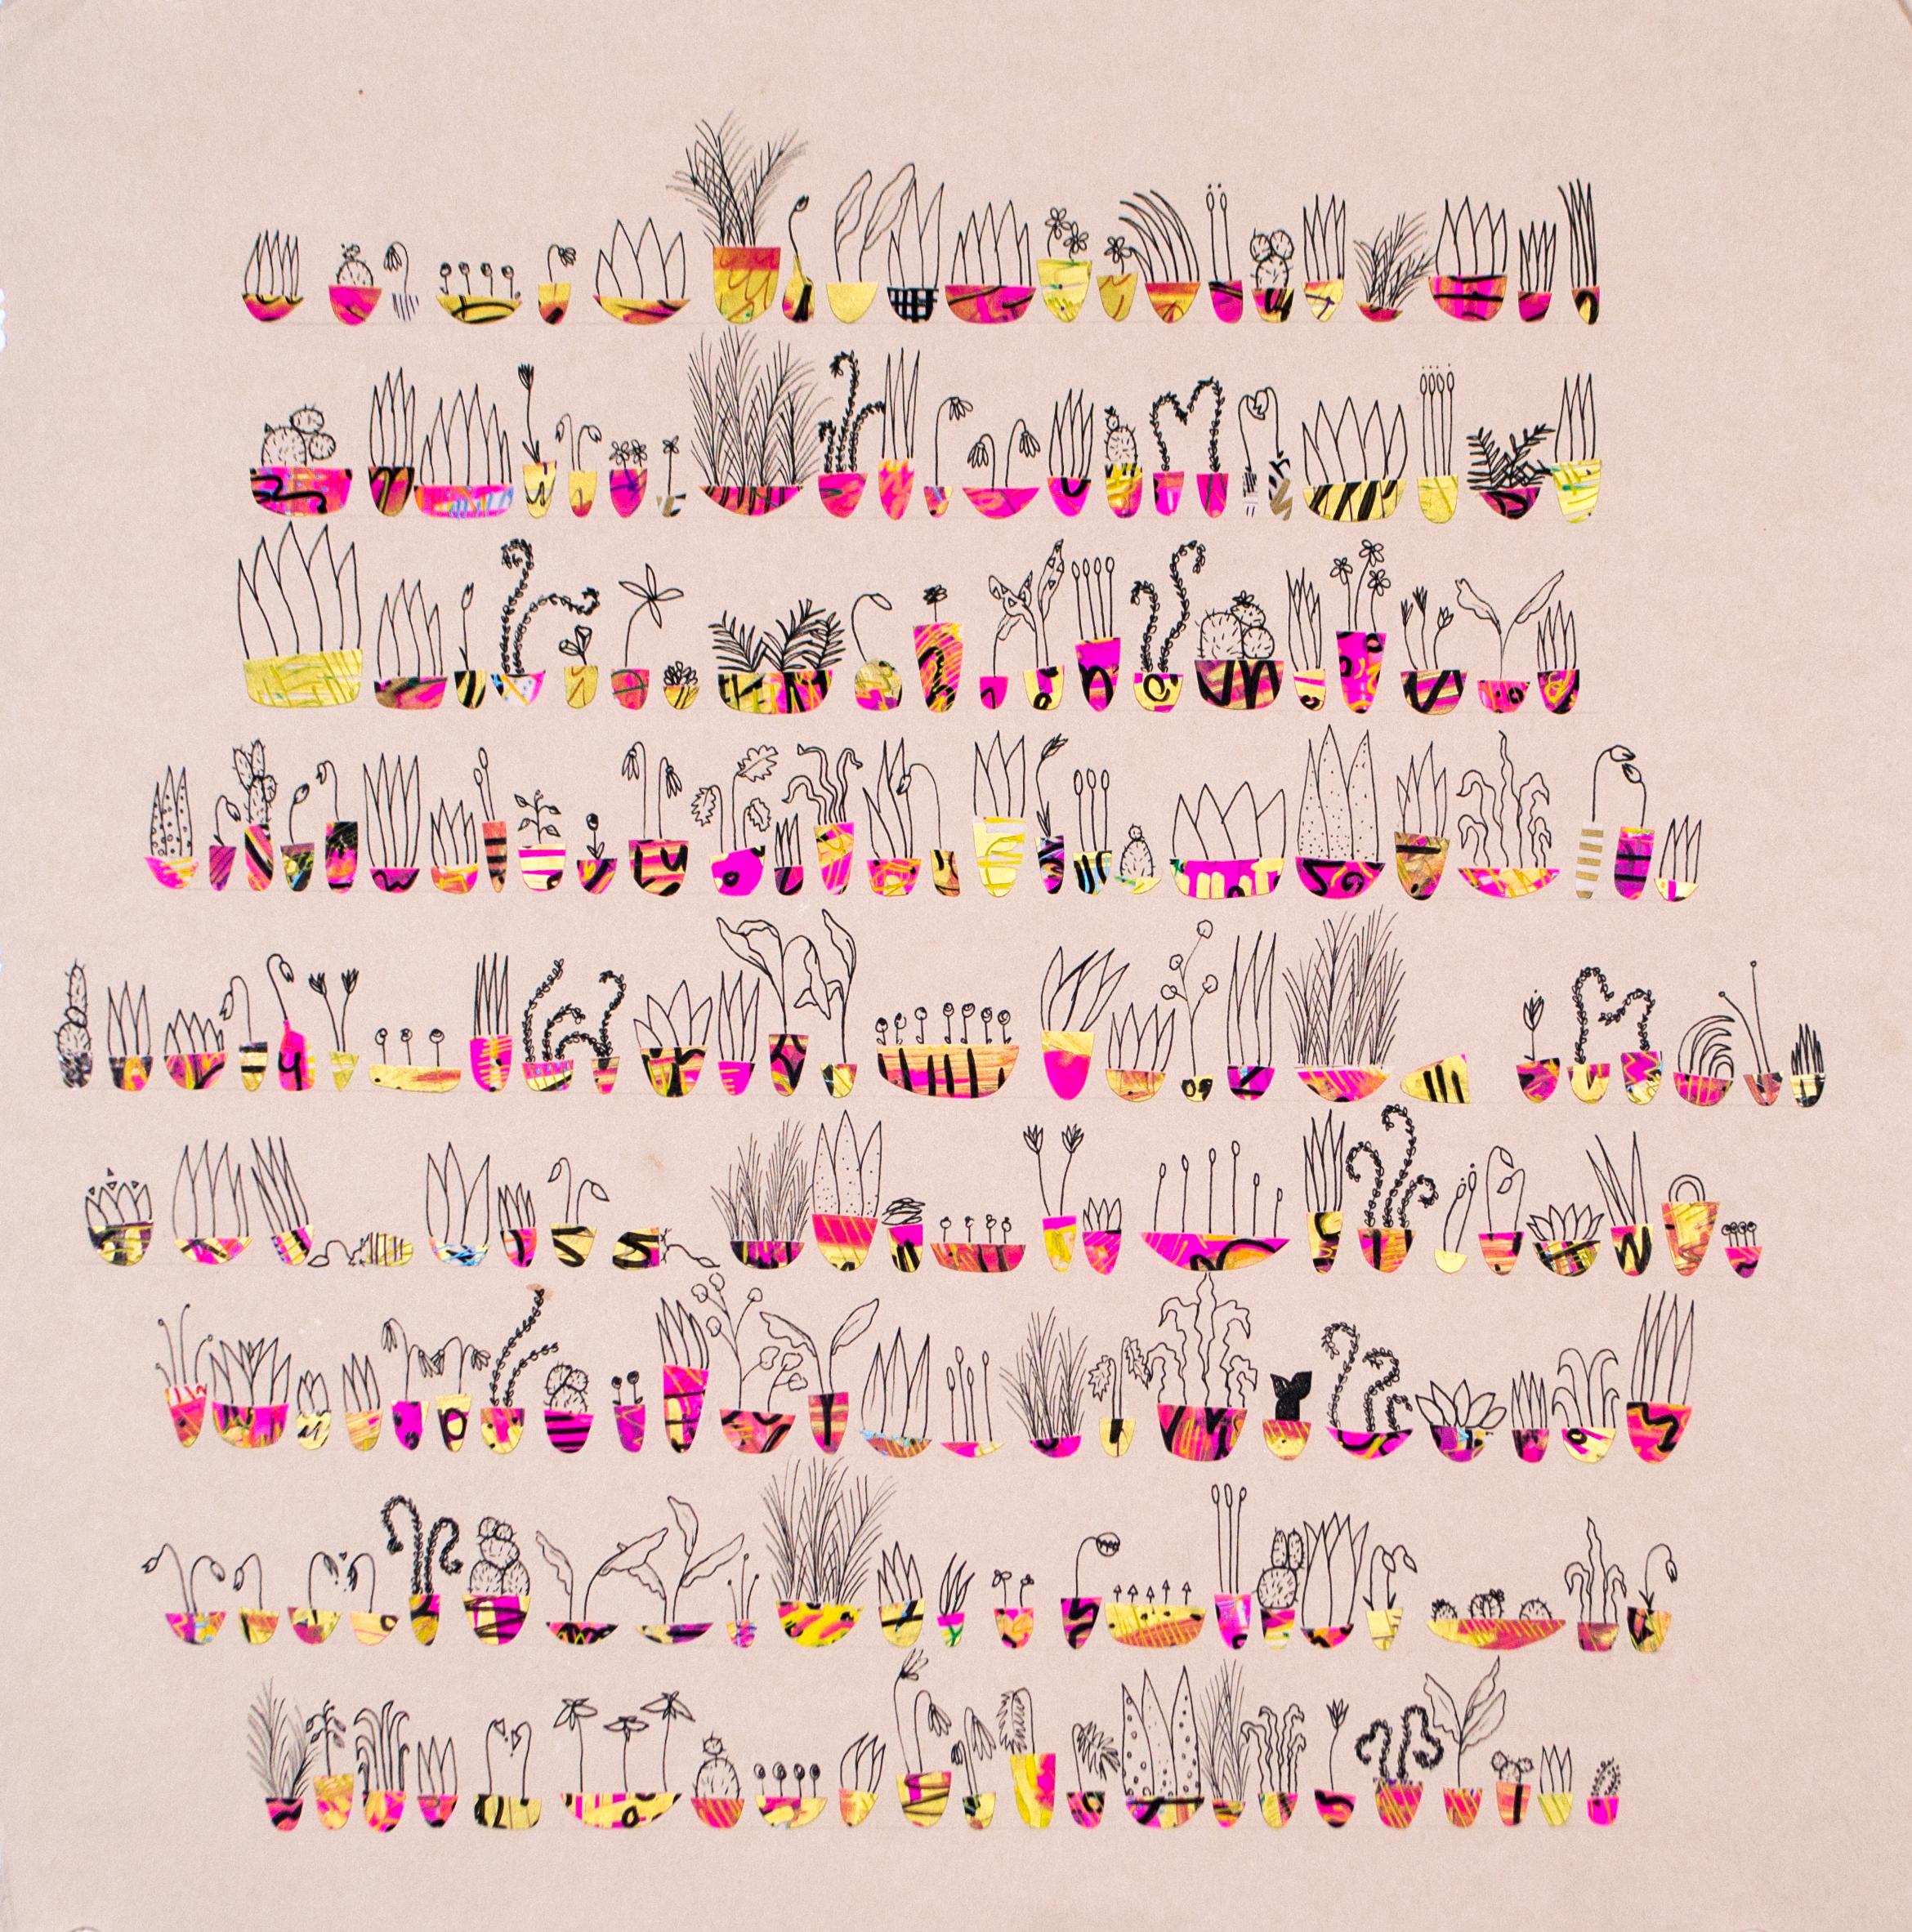 pinkandyellow_plants_drawing.jpg